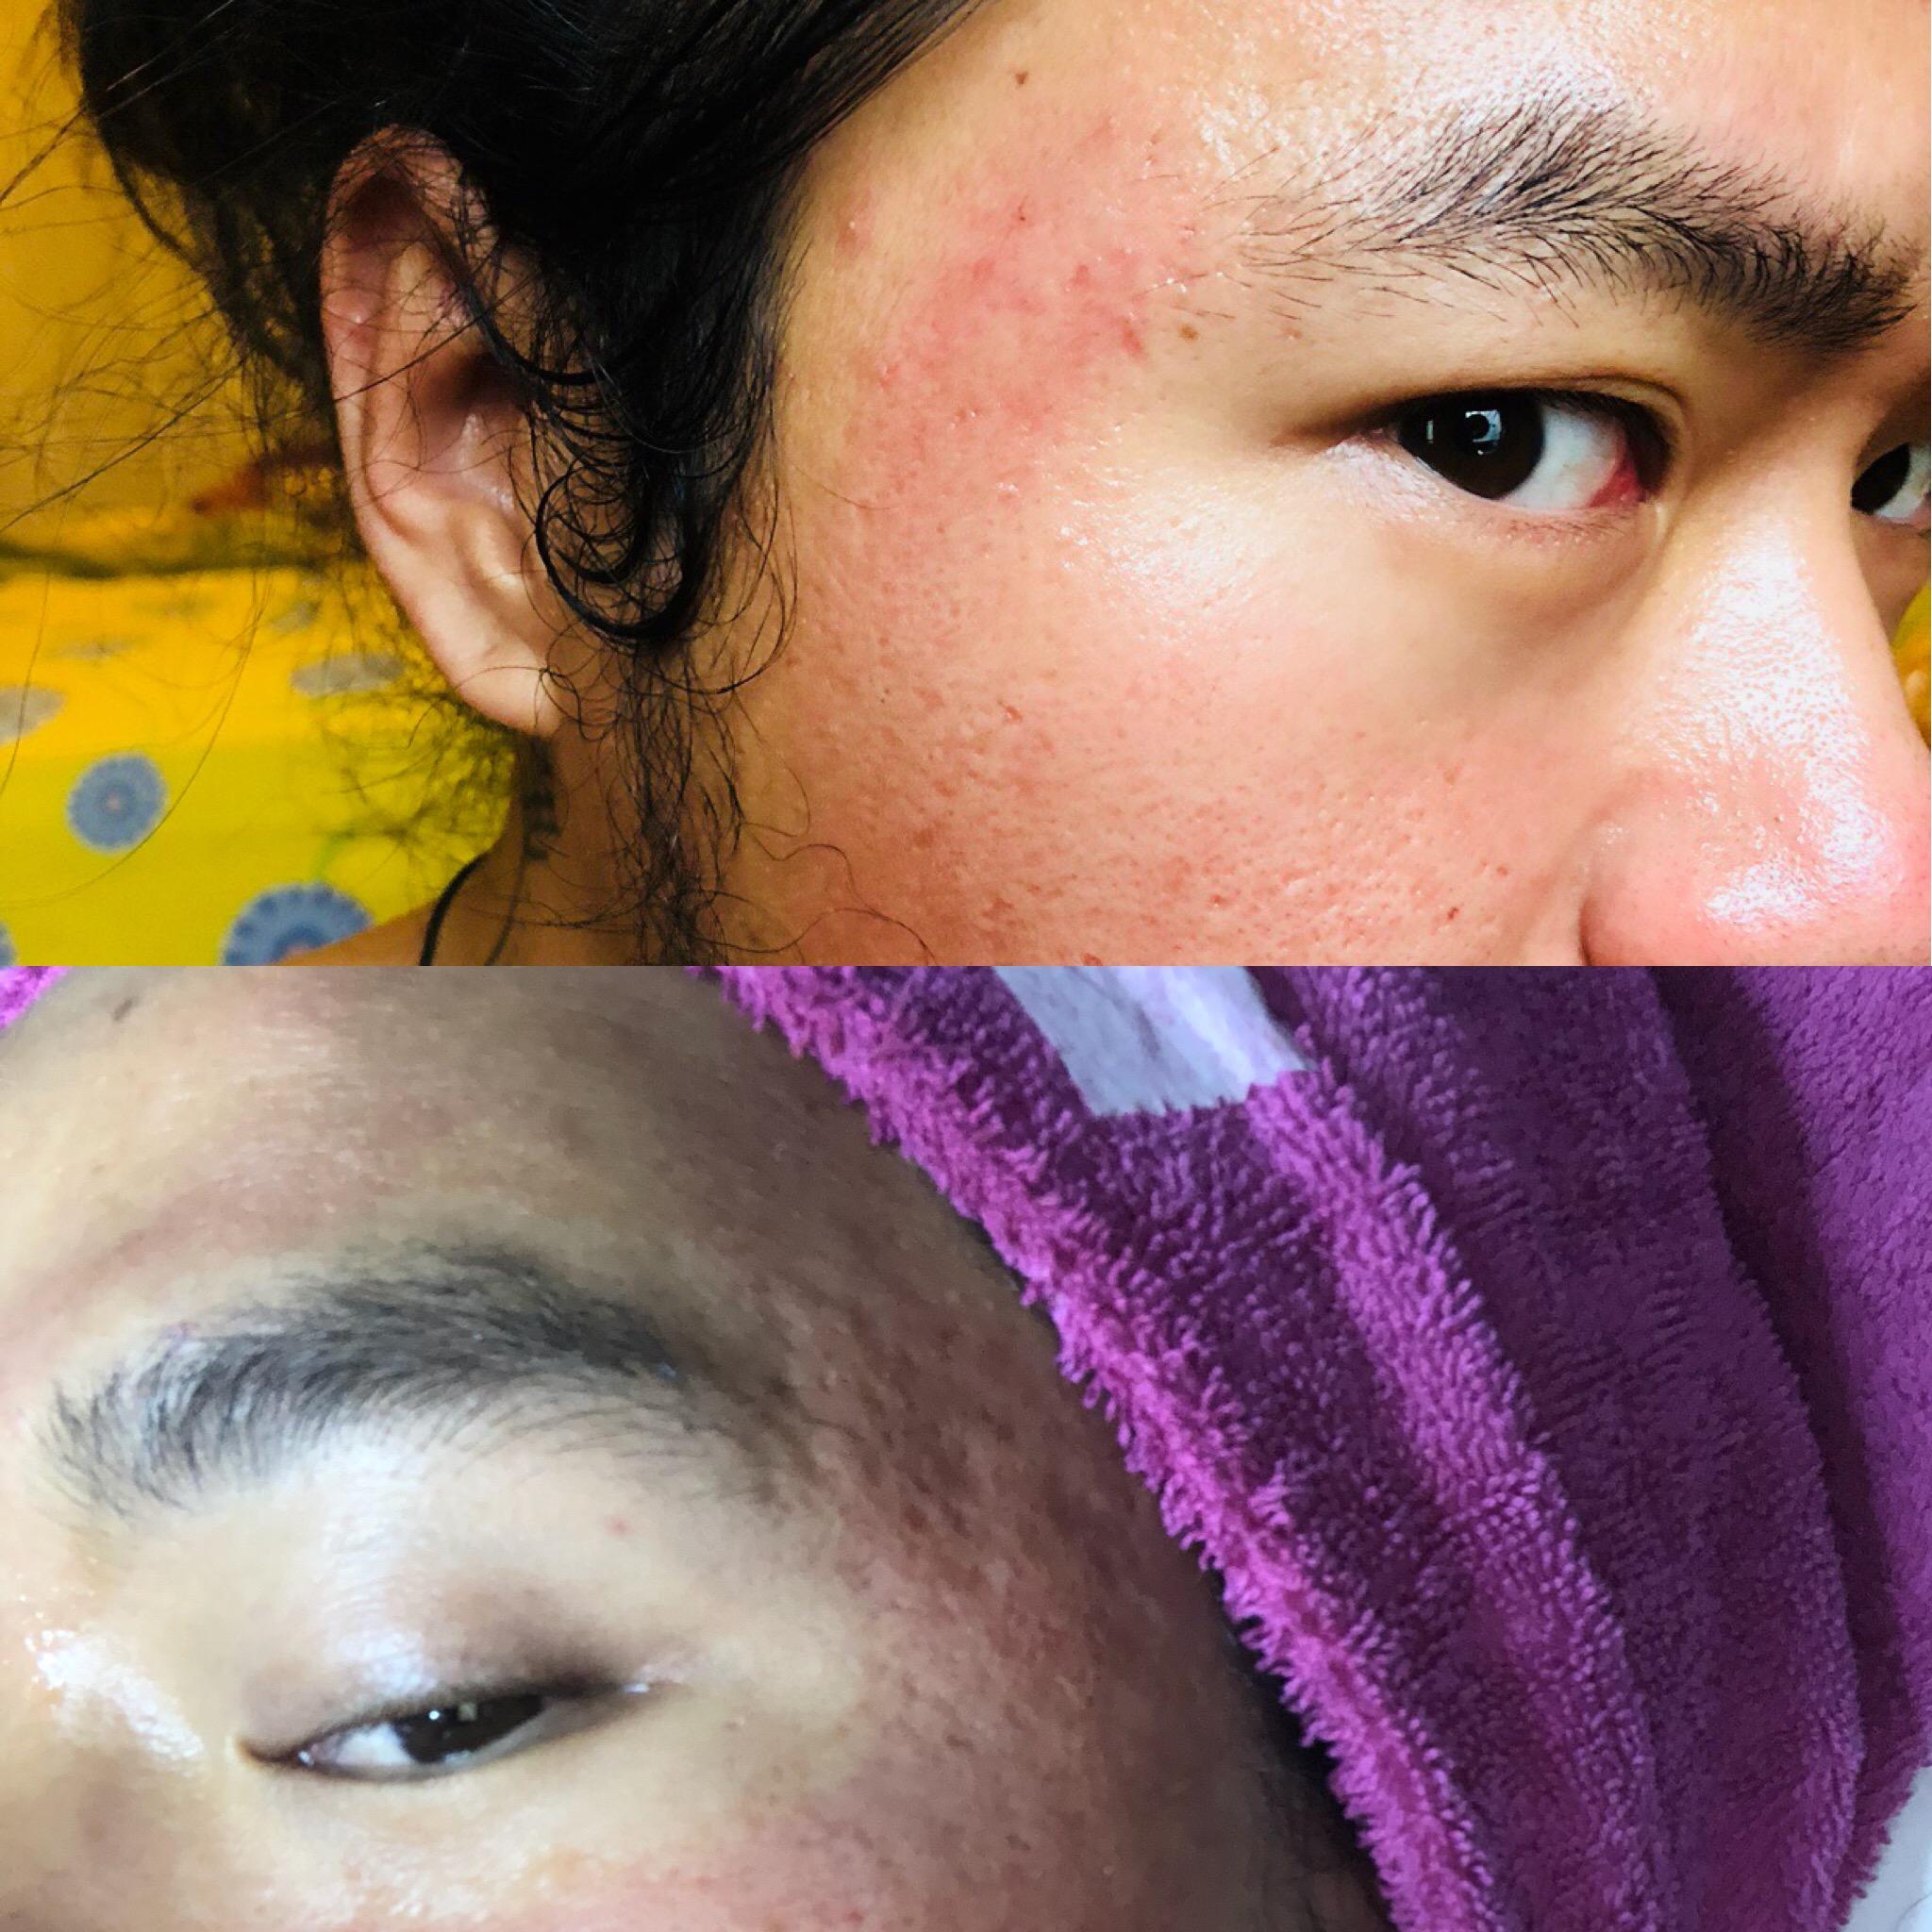 atas: after - bawah: before